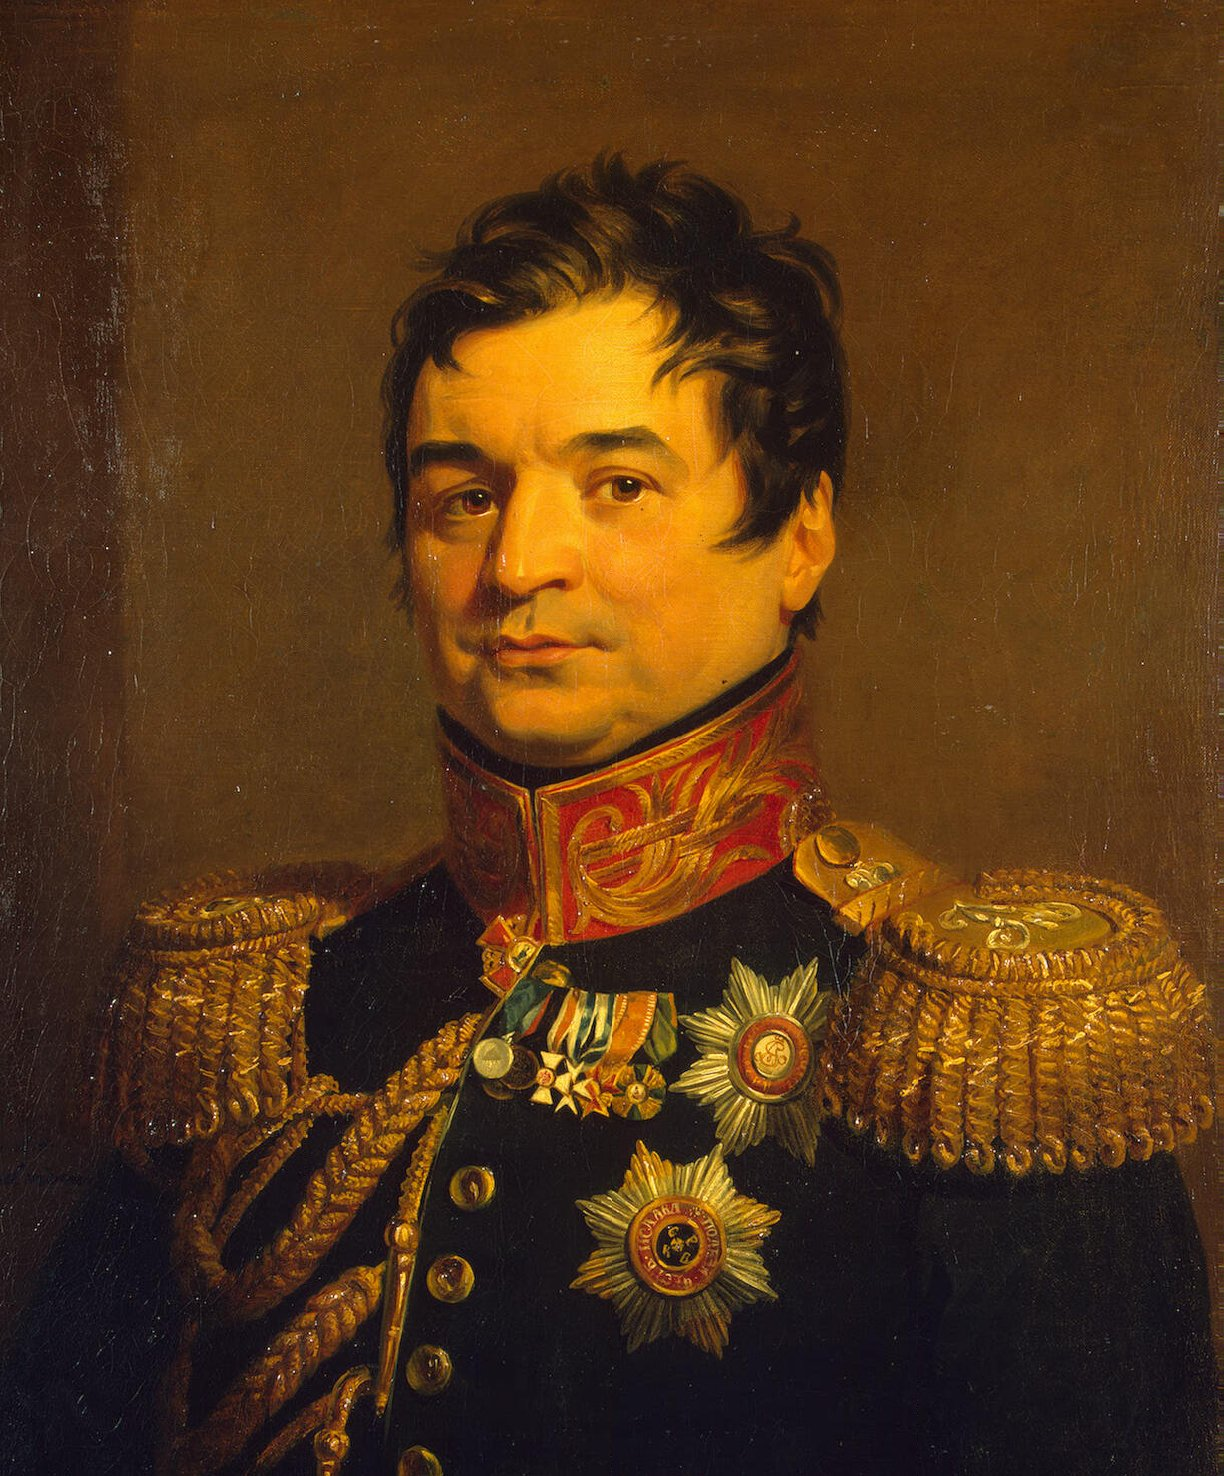 Балашов, Александр Дмитриевич